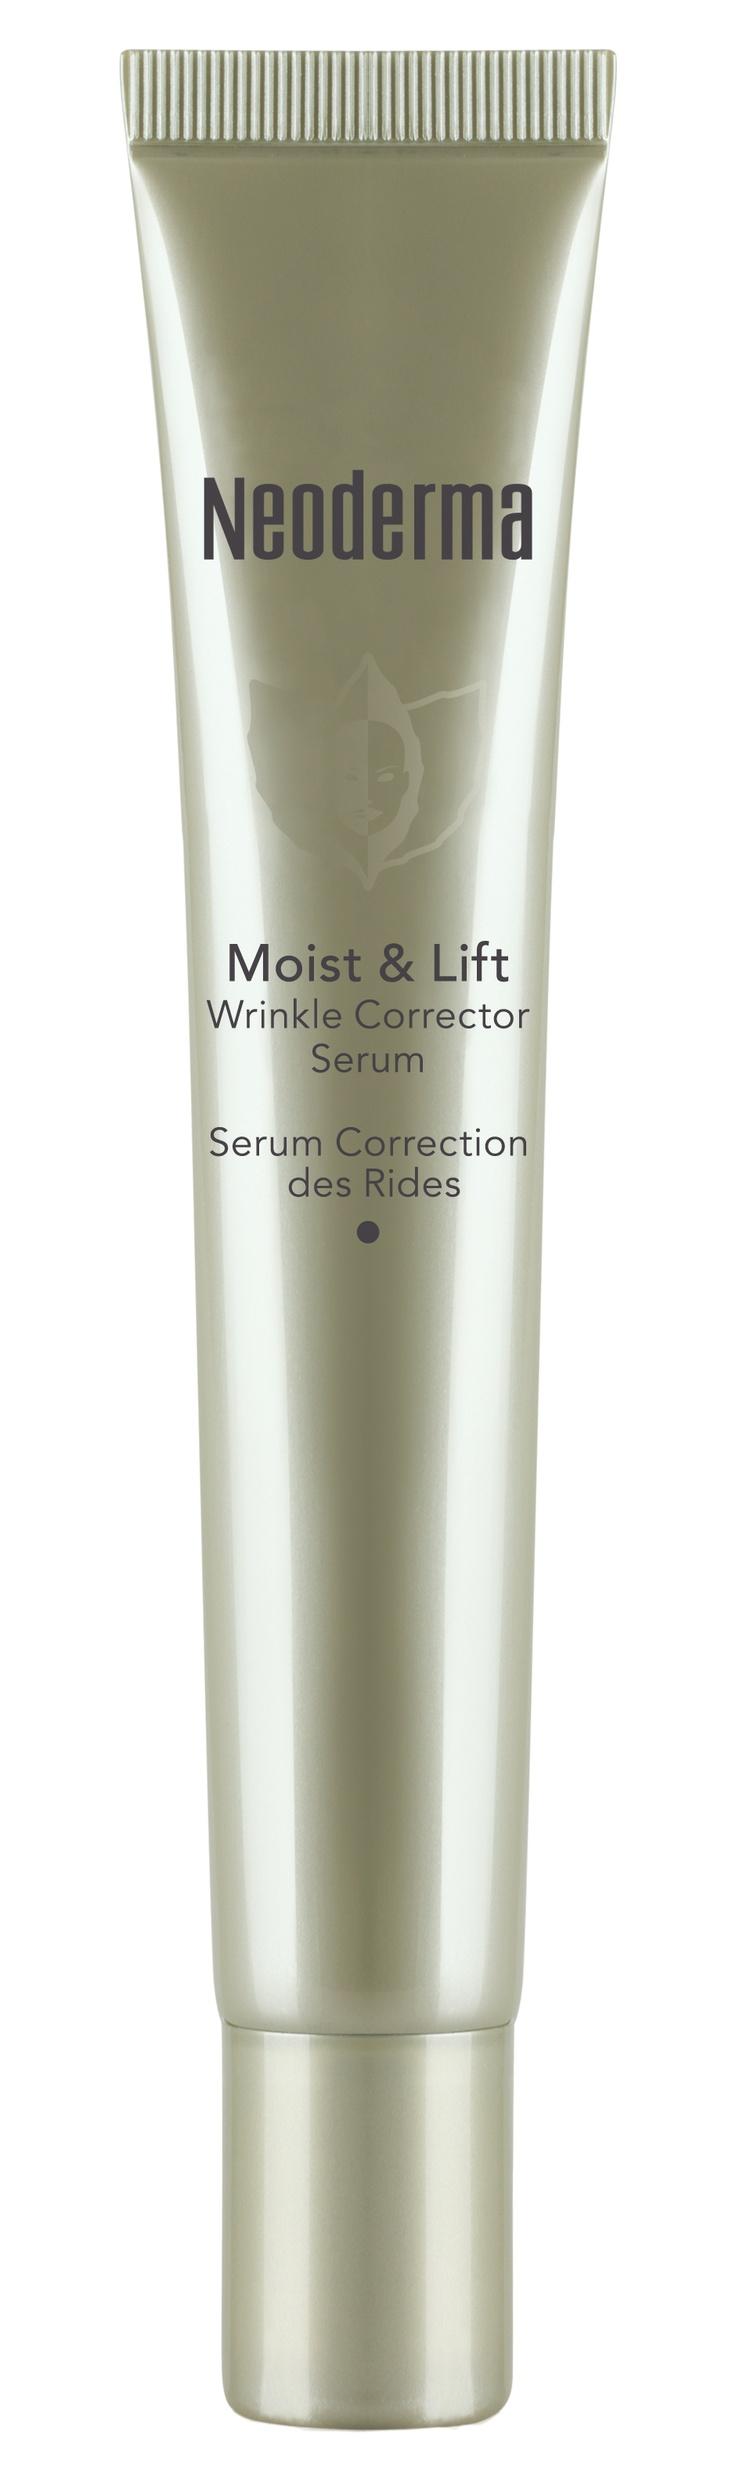 Moist  Wrinkle Corrector Serum 20ml